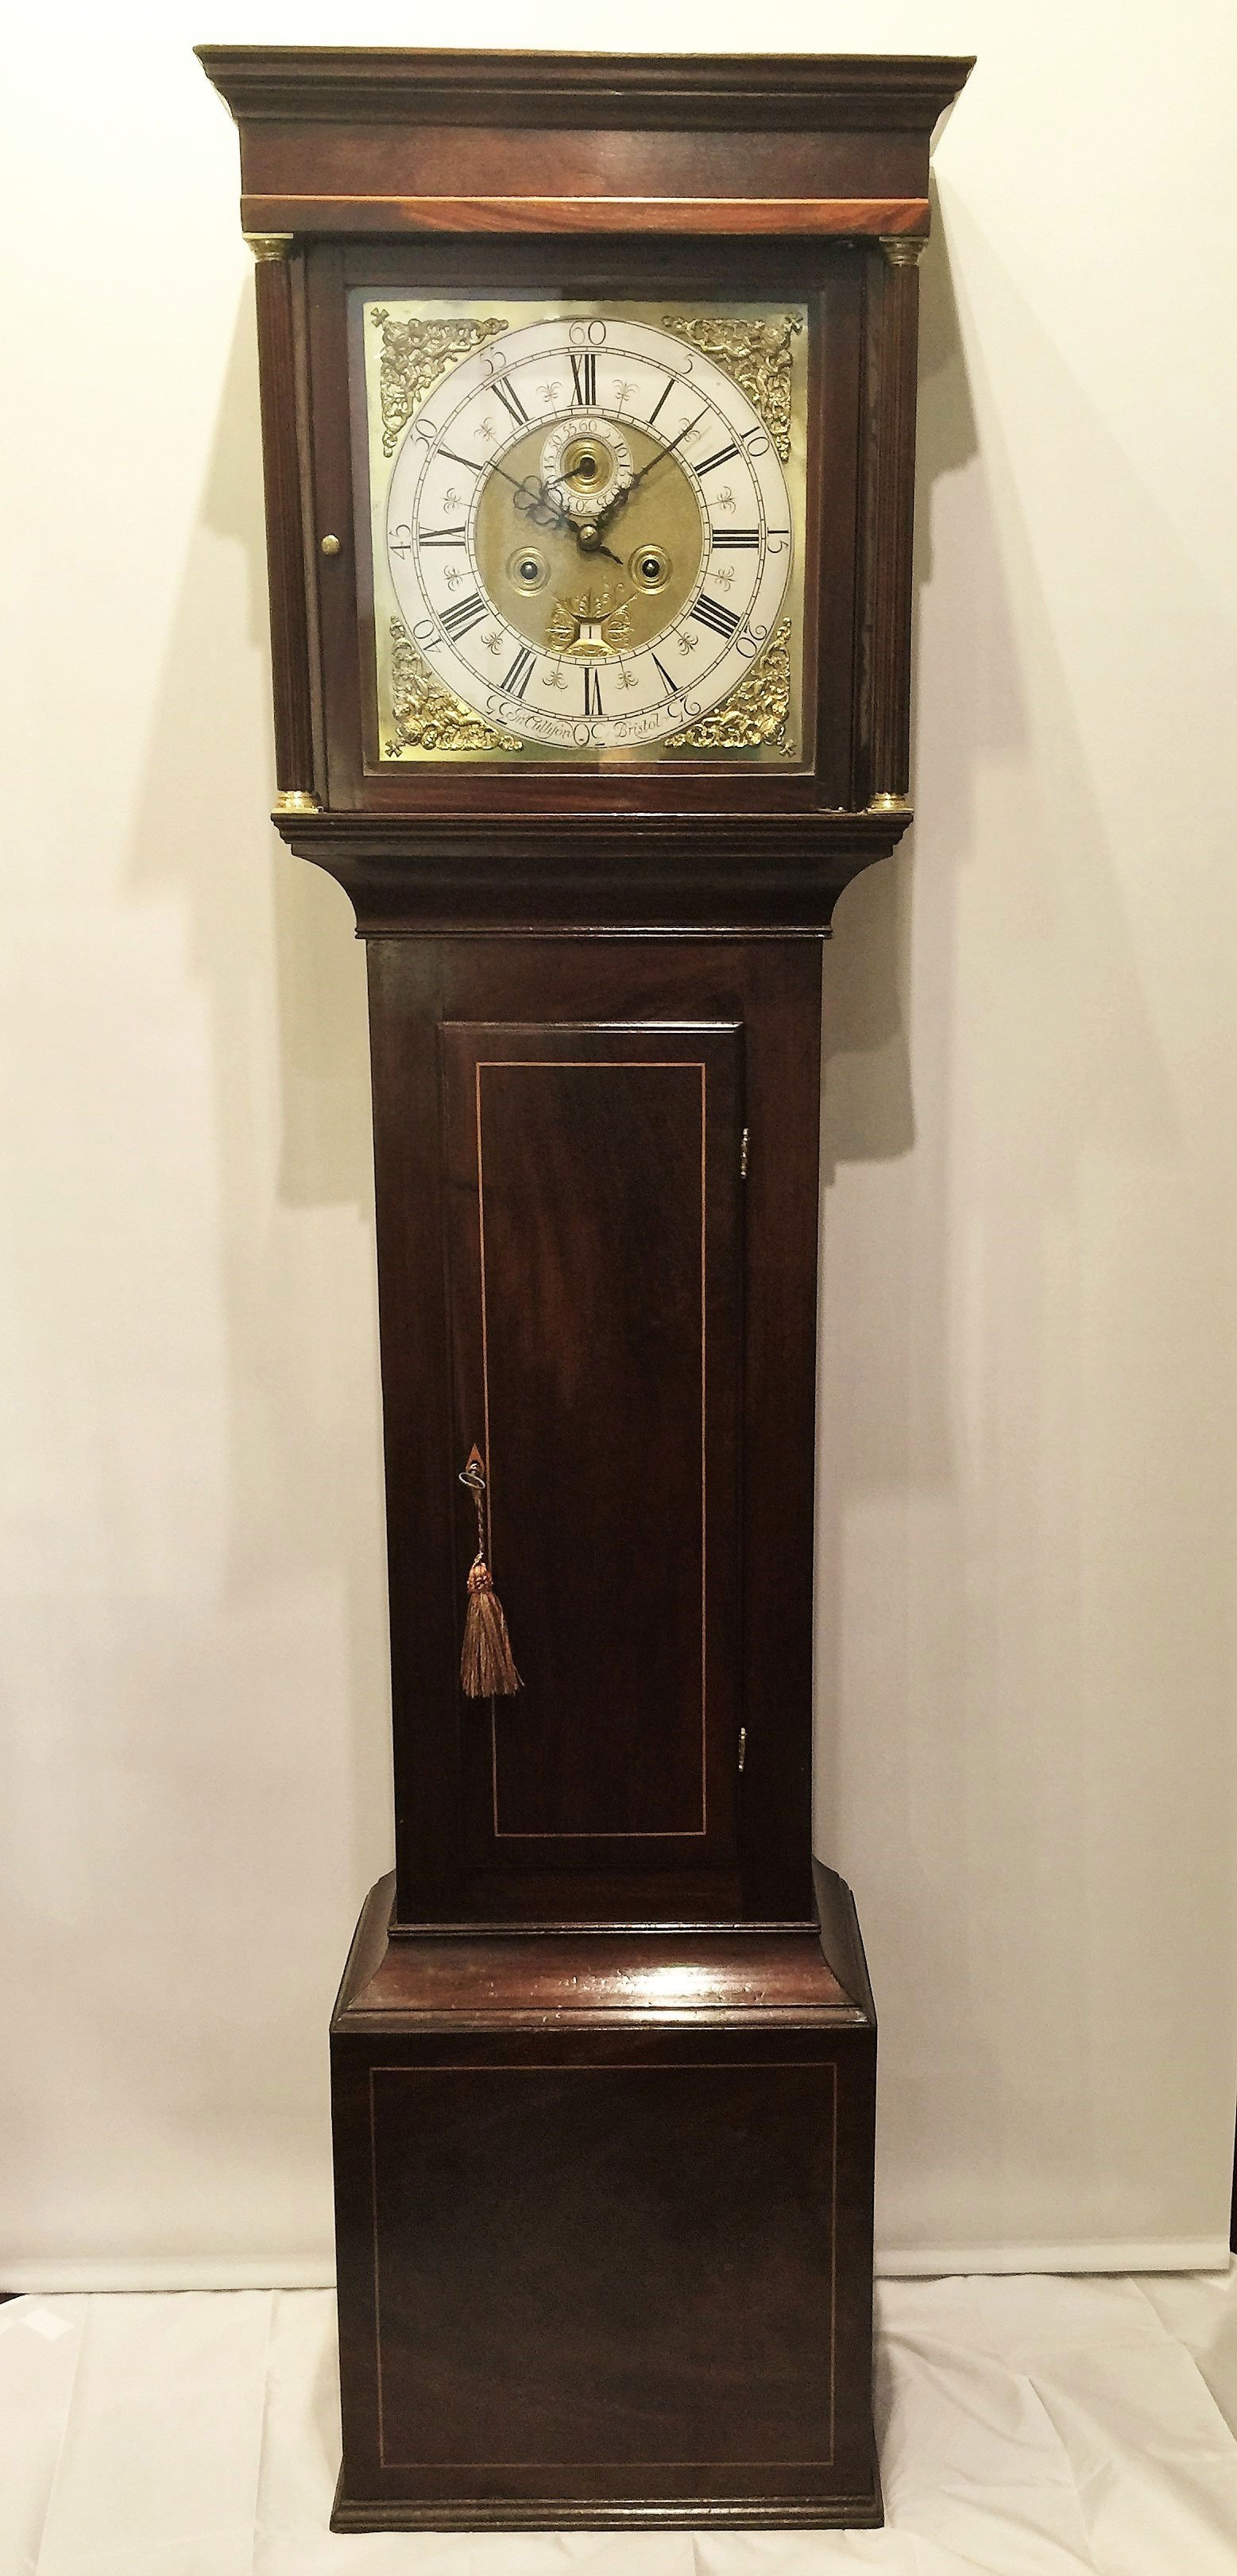 8 day brass dial longcase clock